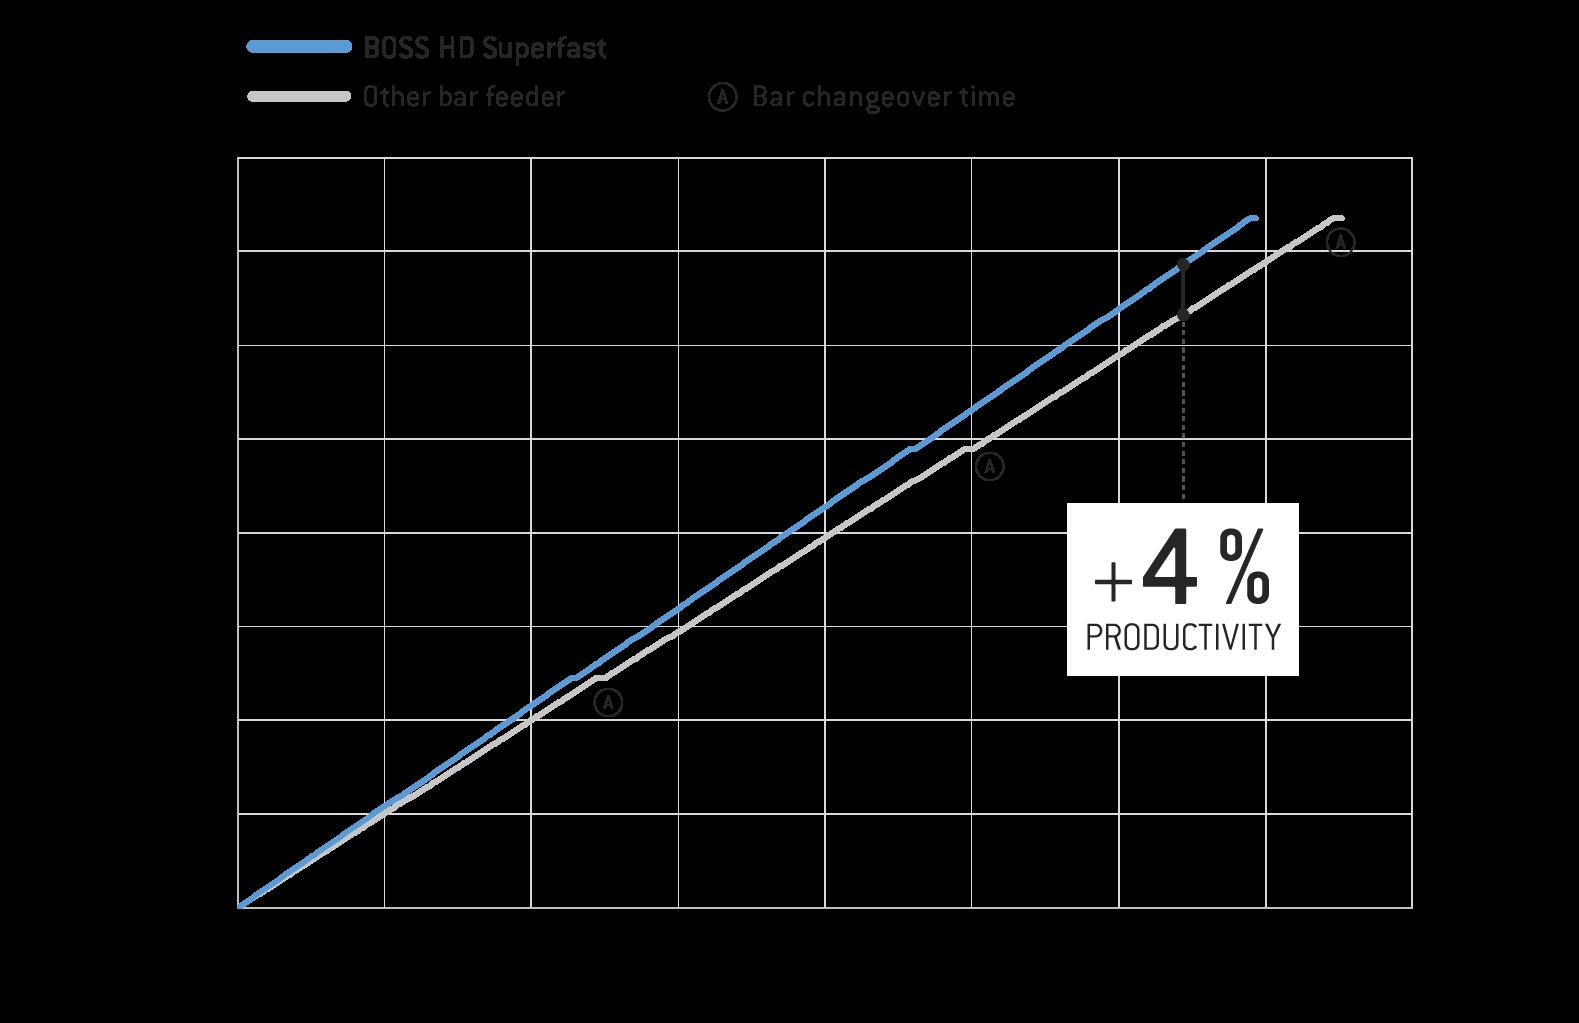 Infografica tecnologia superveloce Iemca